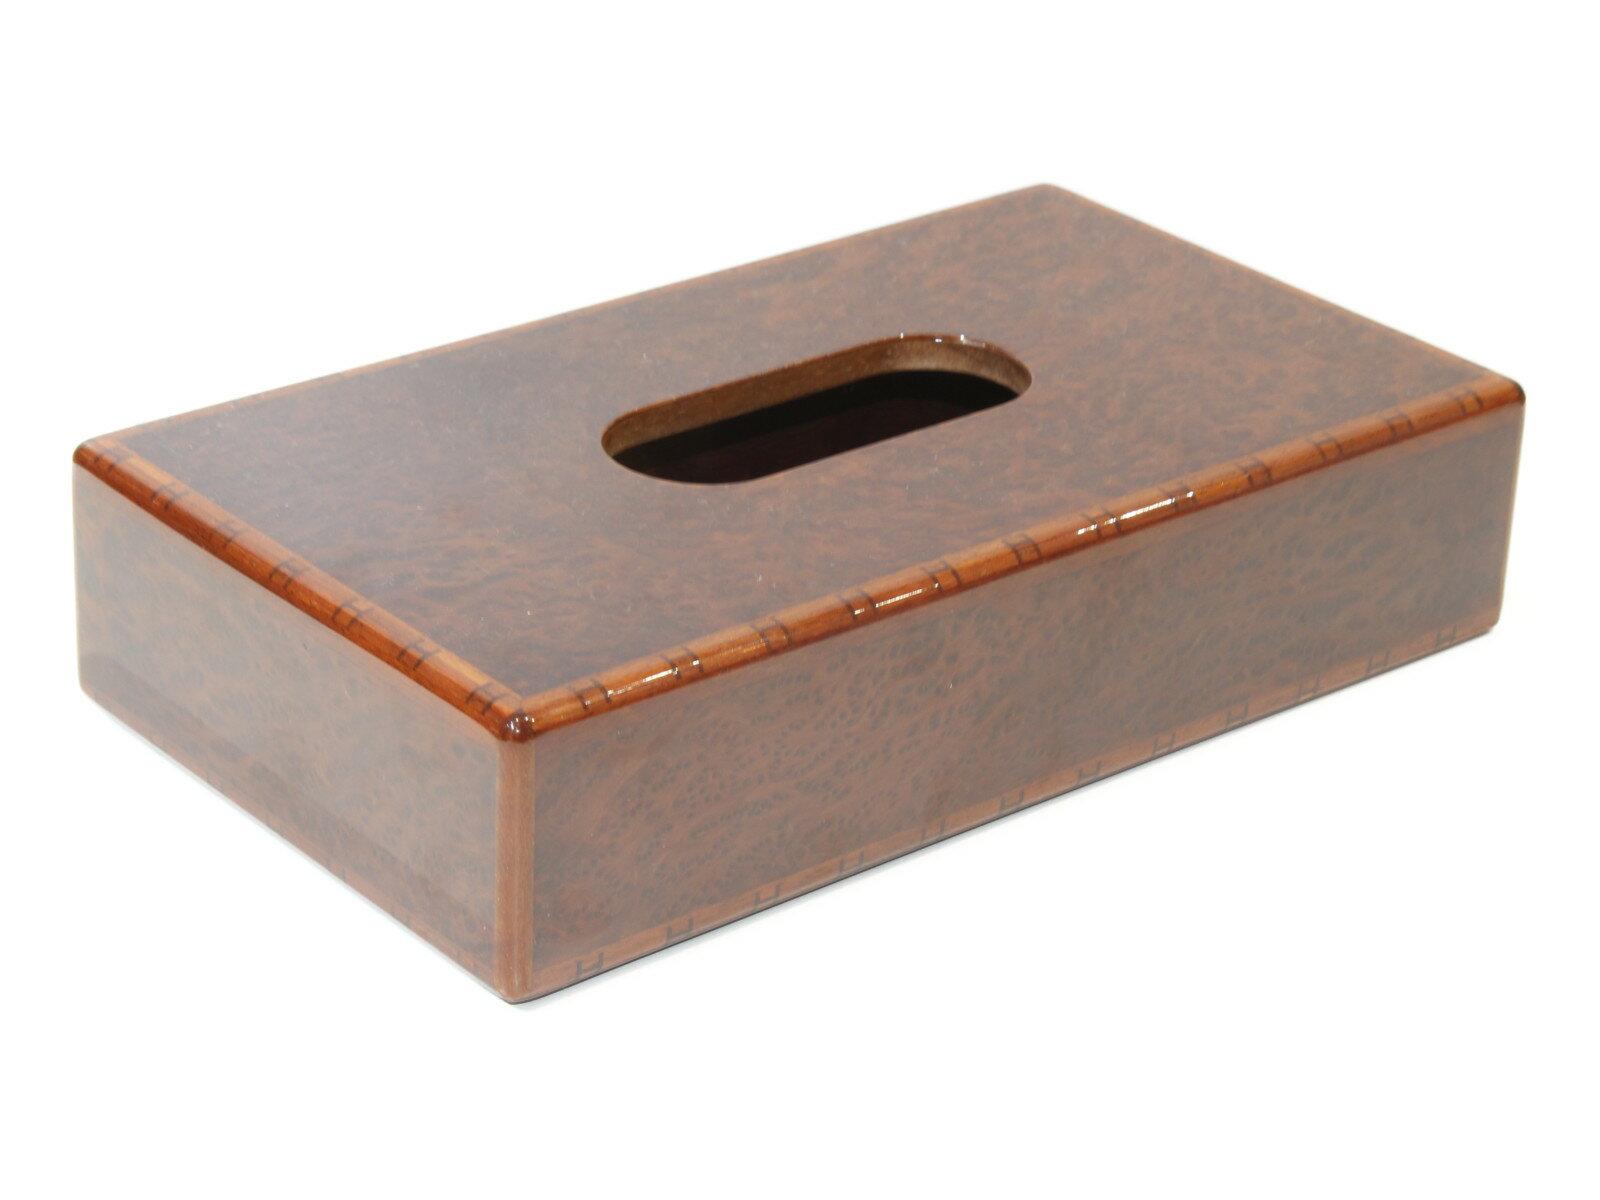 HERMES エルメスウッドティッシュボックスティッシュケース 木 レアインテリア プレゼント包装可【中古】